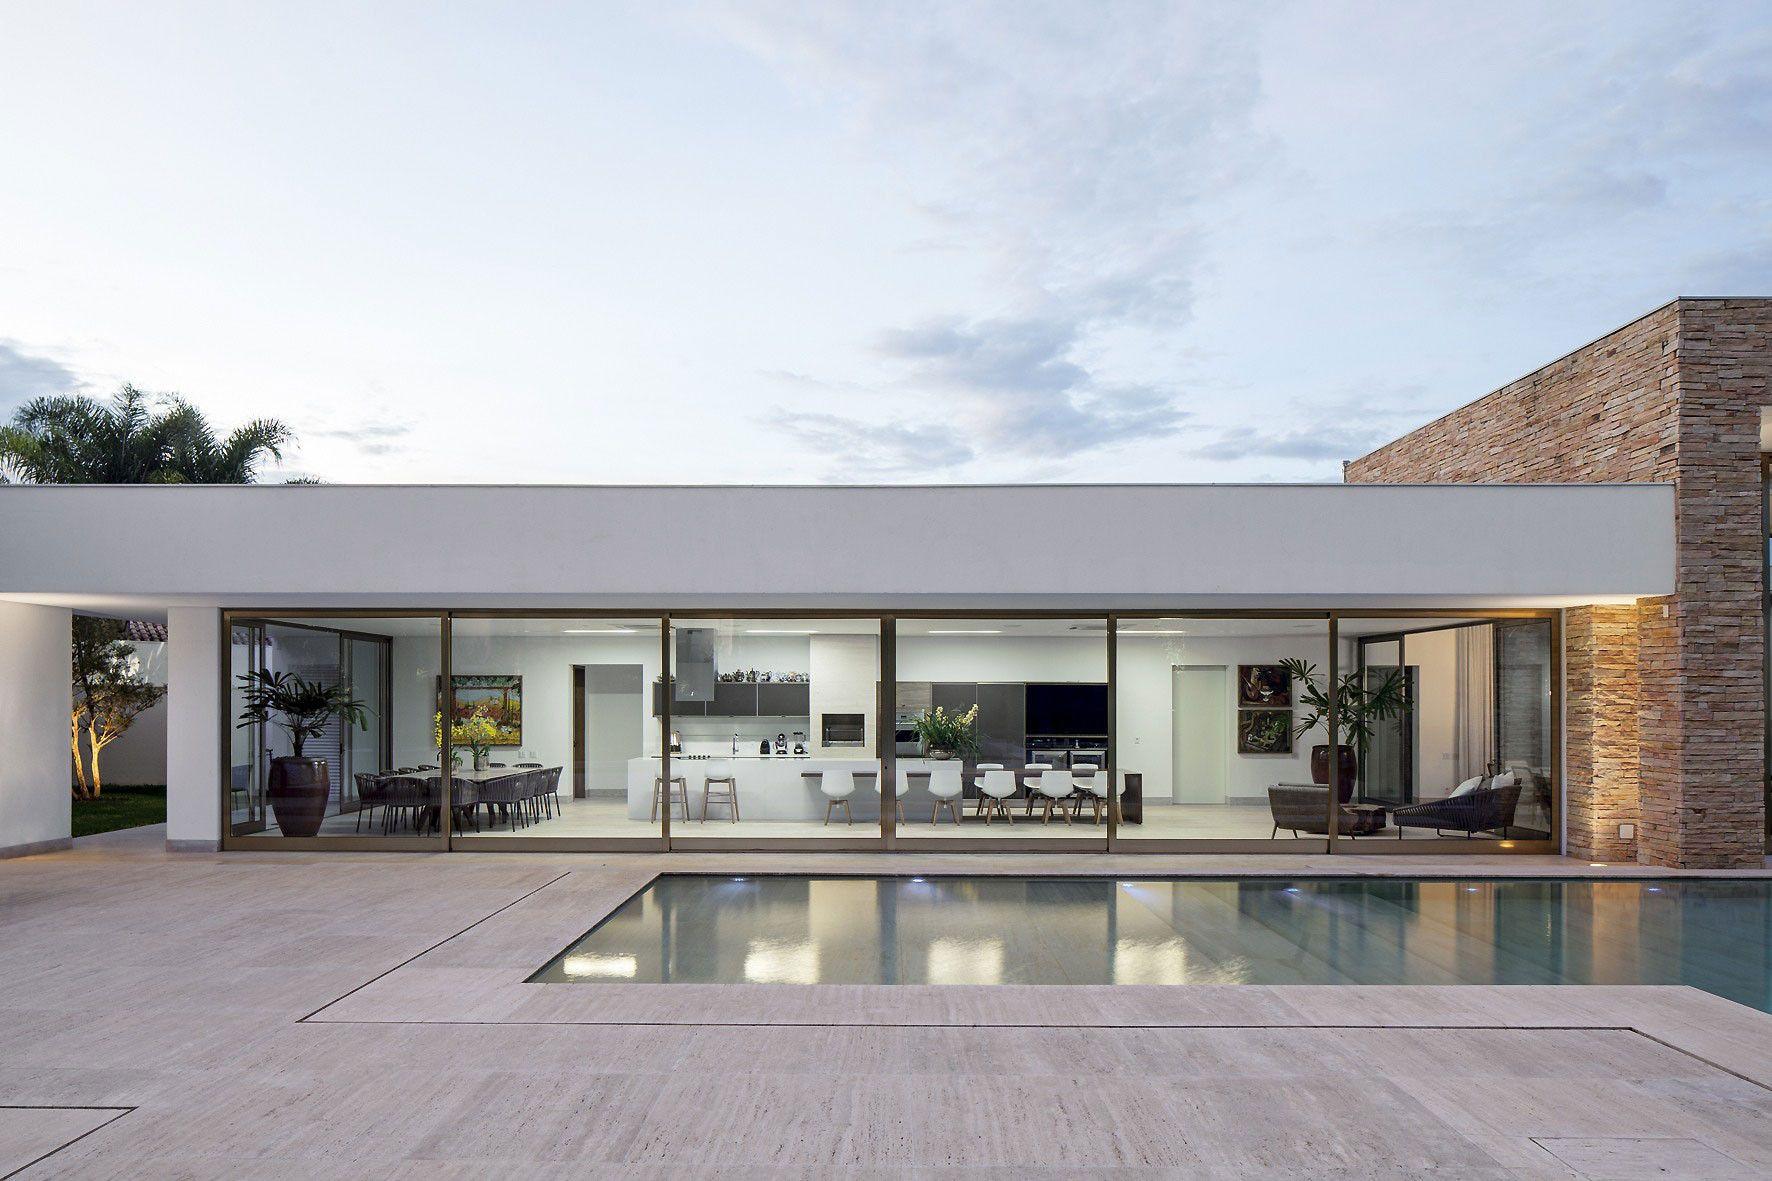 Maison Moderne Carre Avec Piscine Moderne Et Keyword 24 1772x1181px